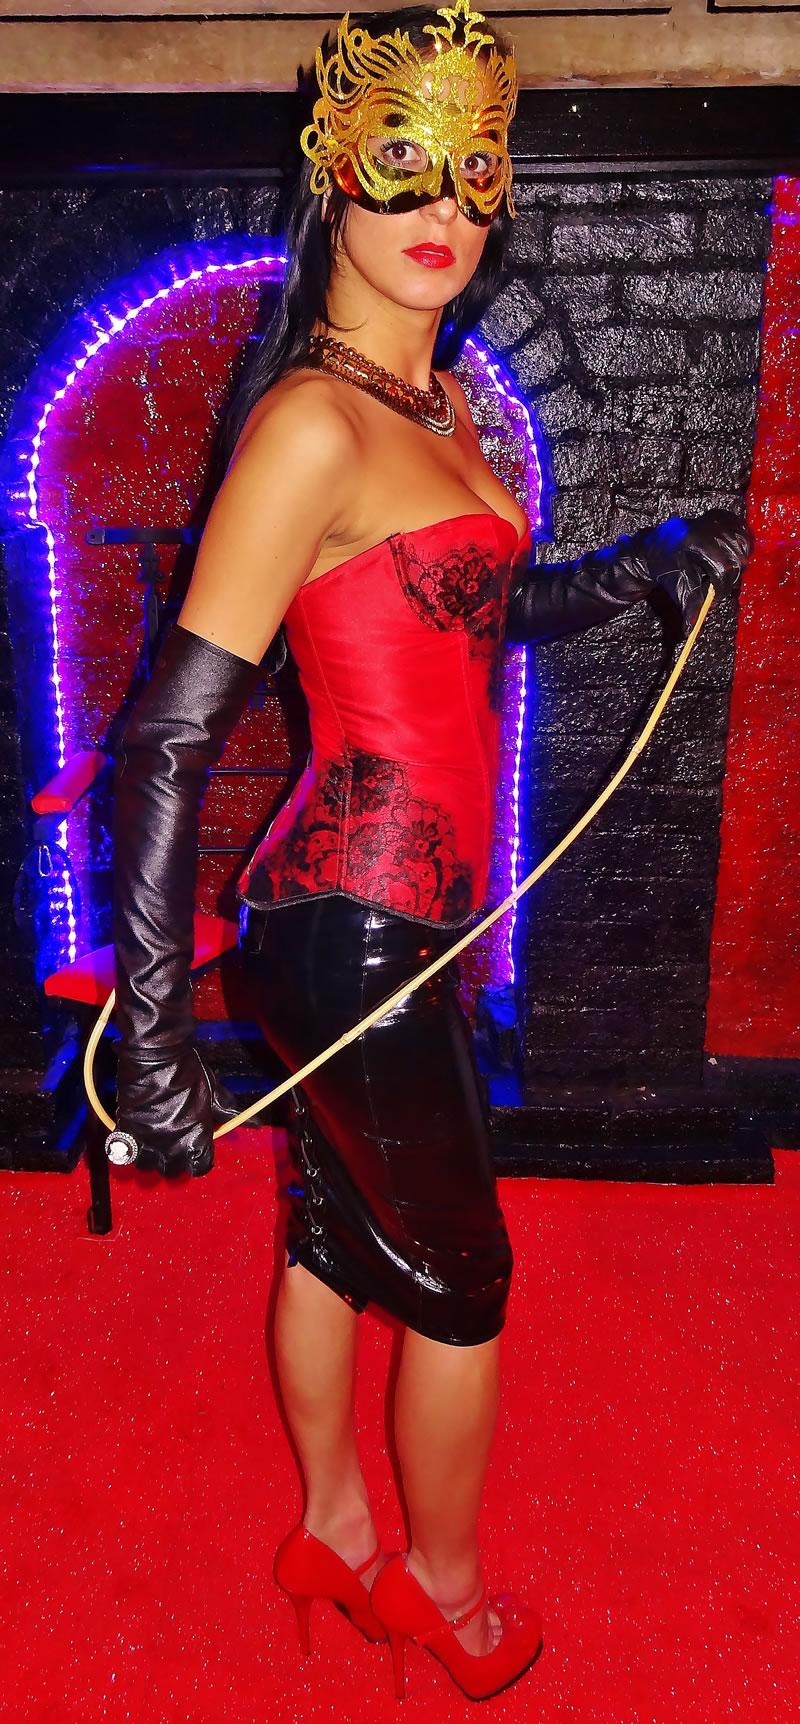 birmingham-mistress-03132